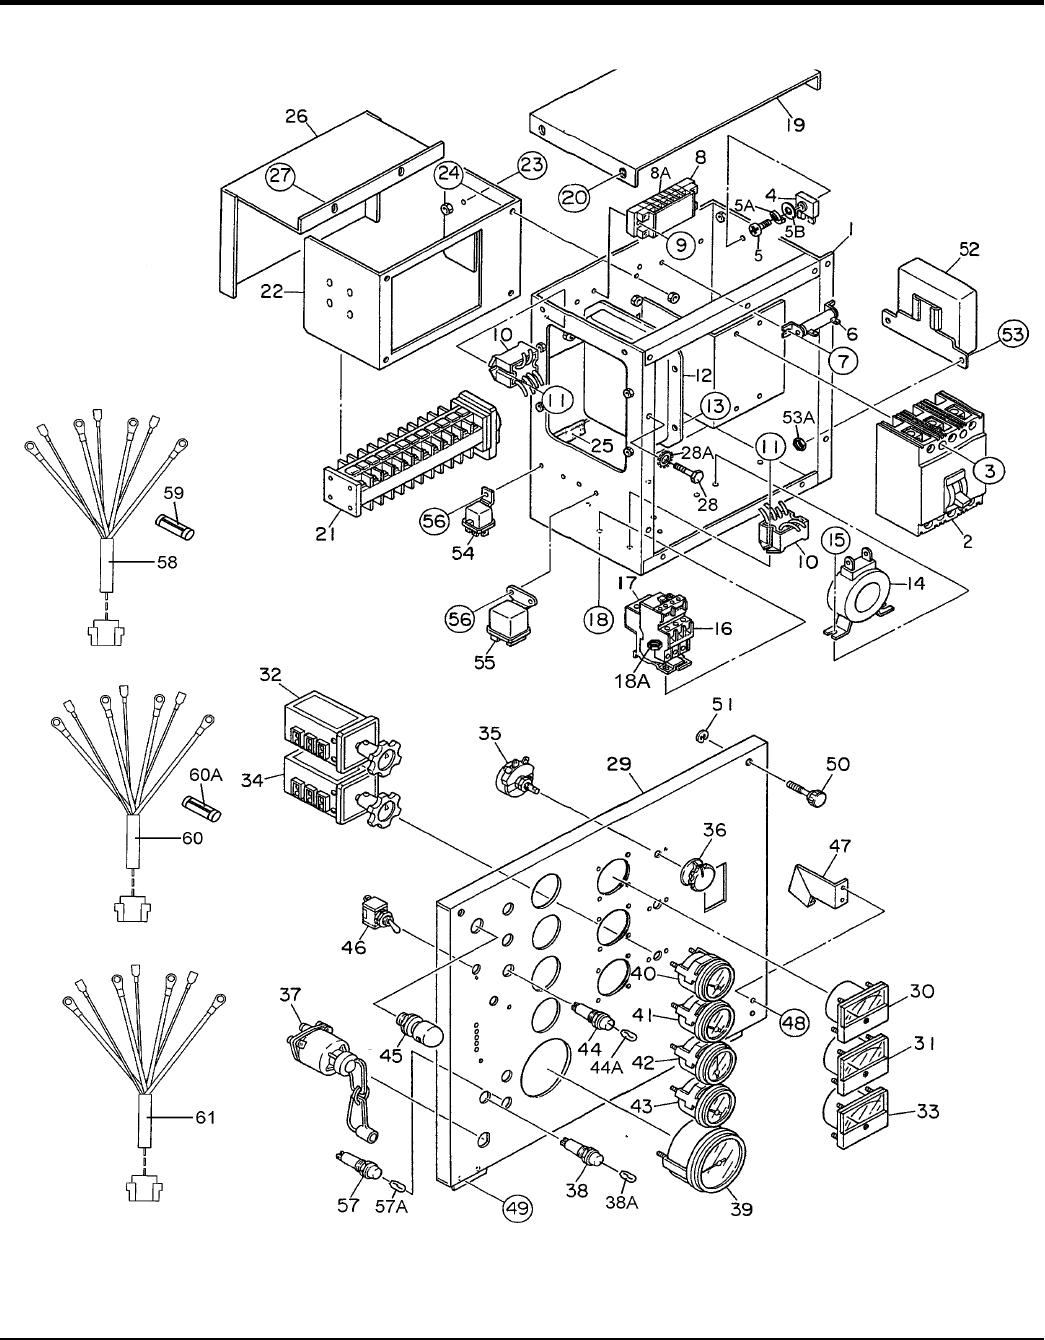 50 rv receptacle wiring wiring diagram database Gravely Wiring Diagrams multiple wiring diagram 50 gfci spa box wiring diagram install 50 rv receptacle 50 rv receptacle wiring